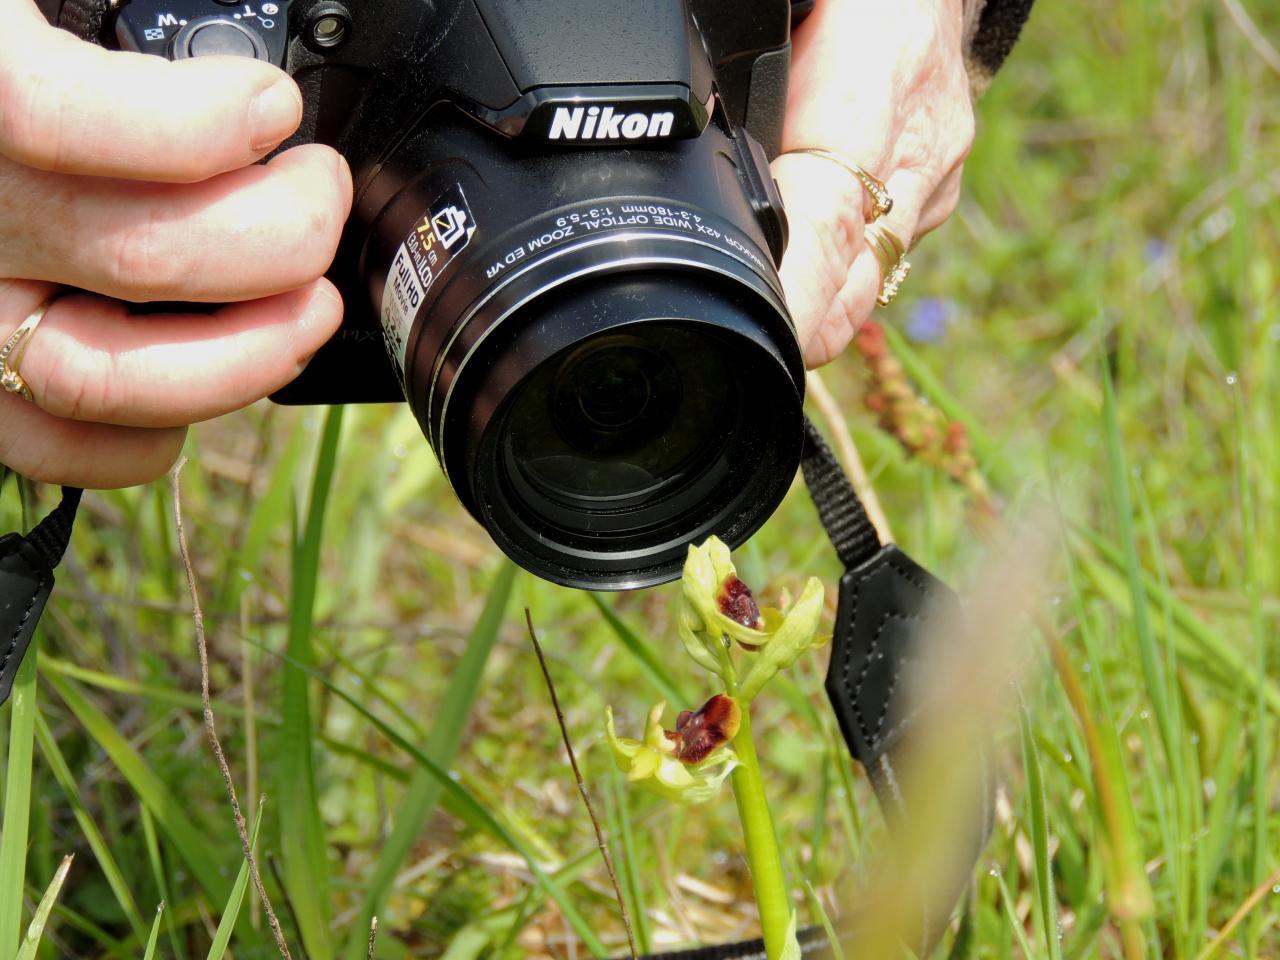 Ophrys araneola, ophrys litigieux